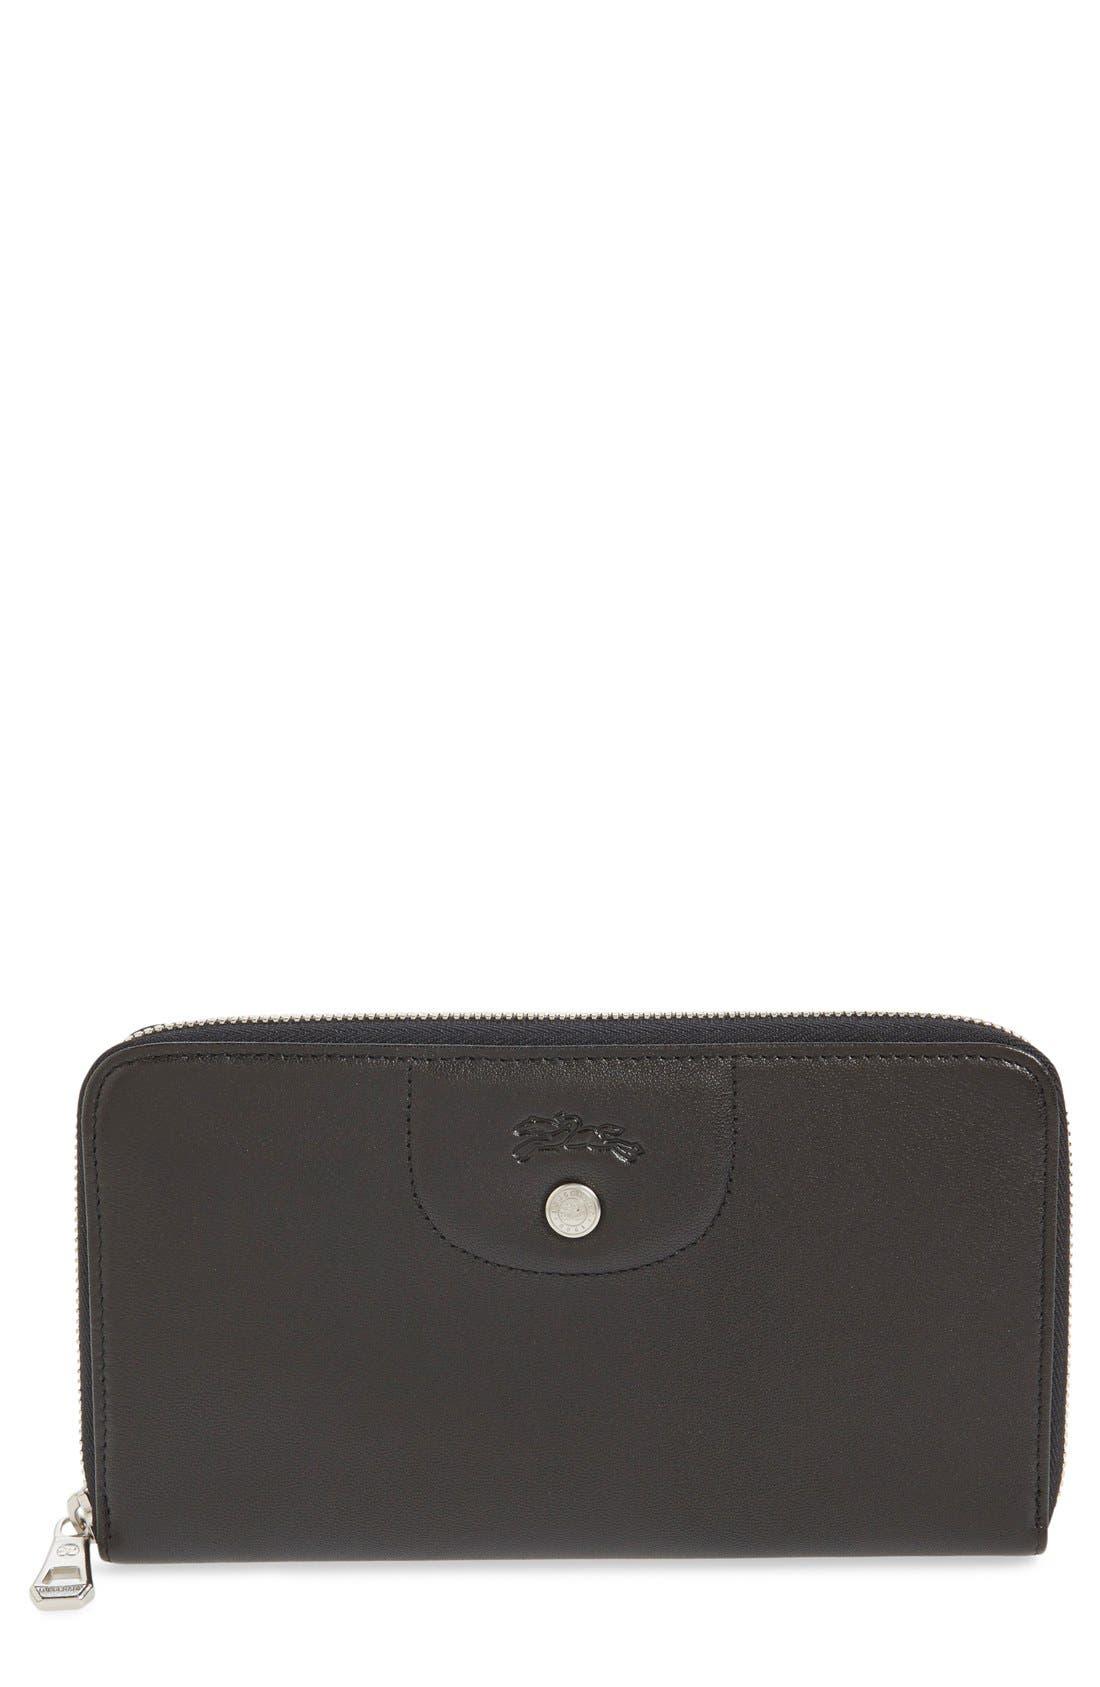 Alternate Image 1 Selected - Longchamp 'Le Pliage' Leather Zip Around Wallet